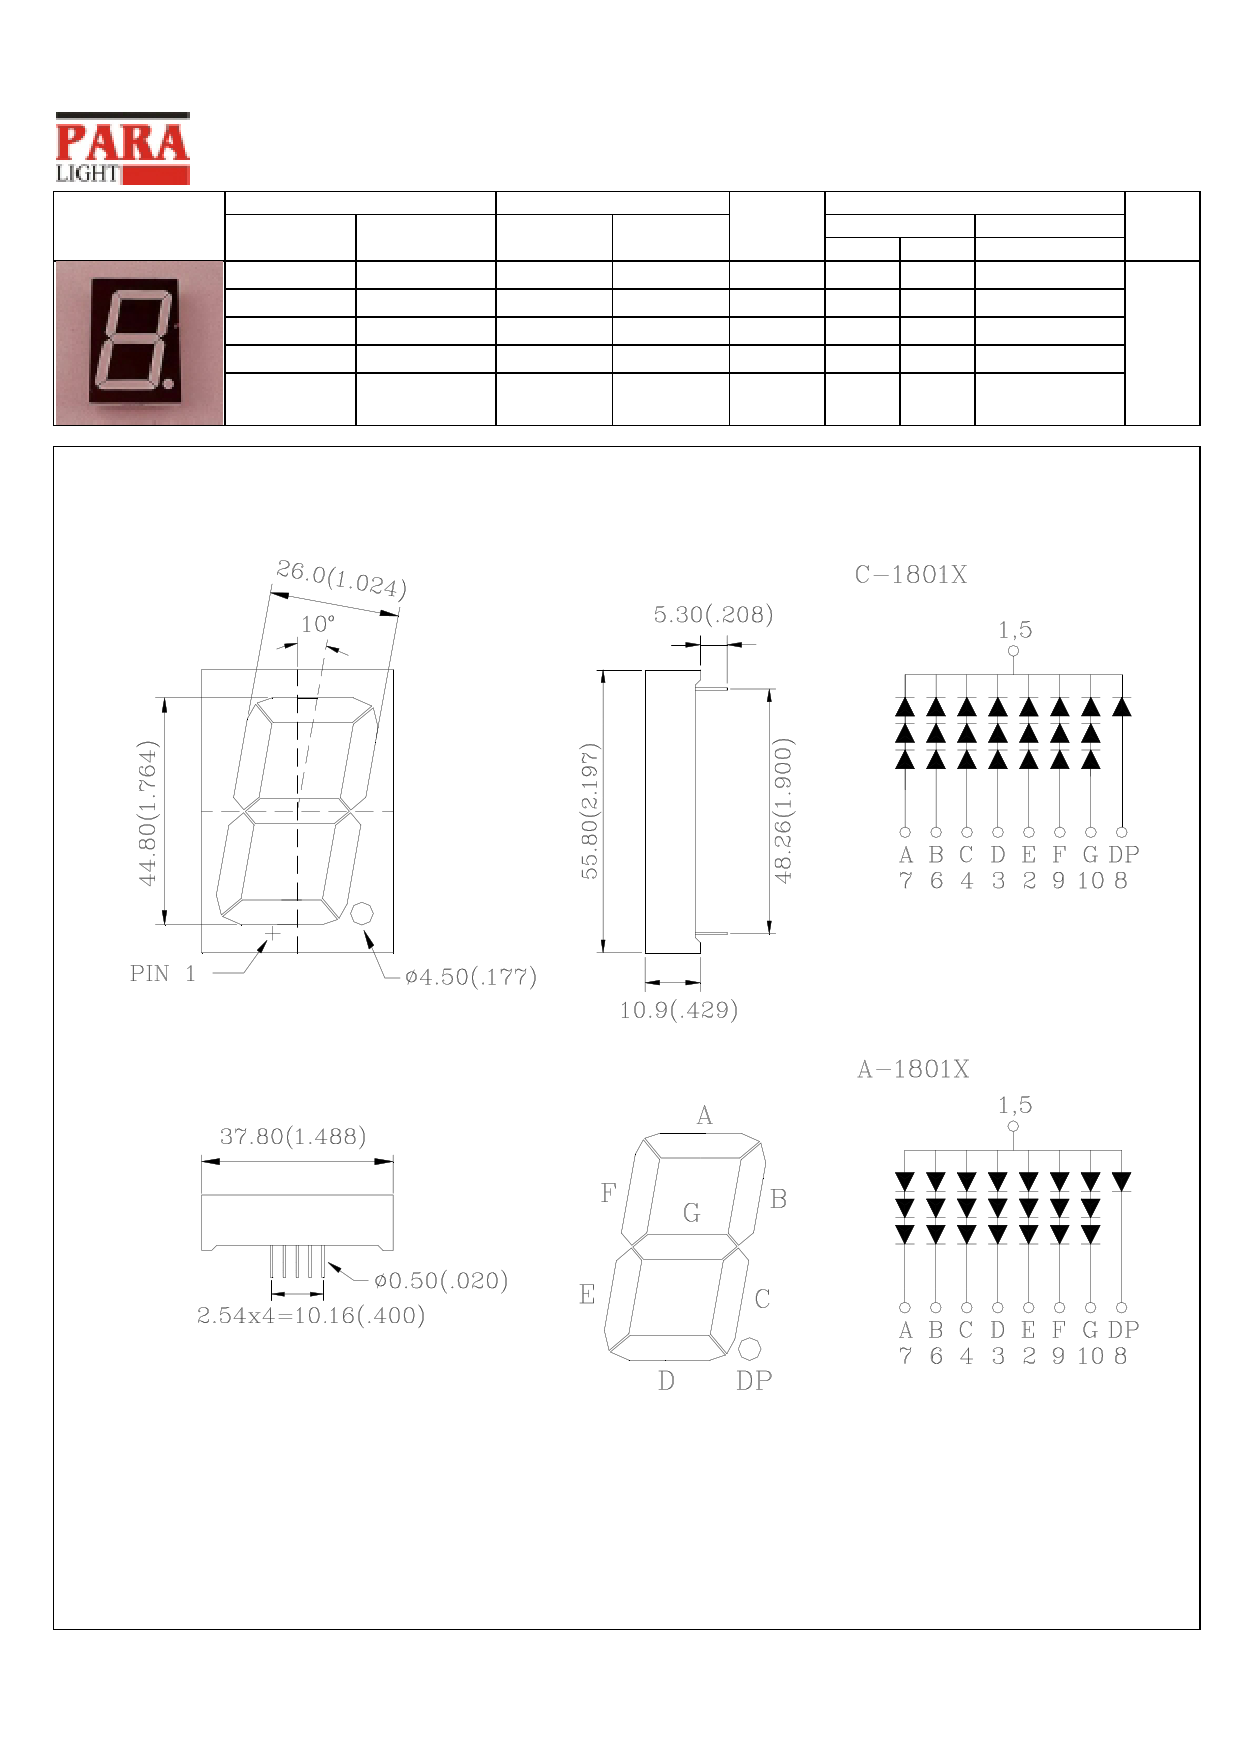 C-1801X datasheet